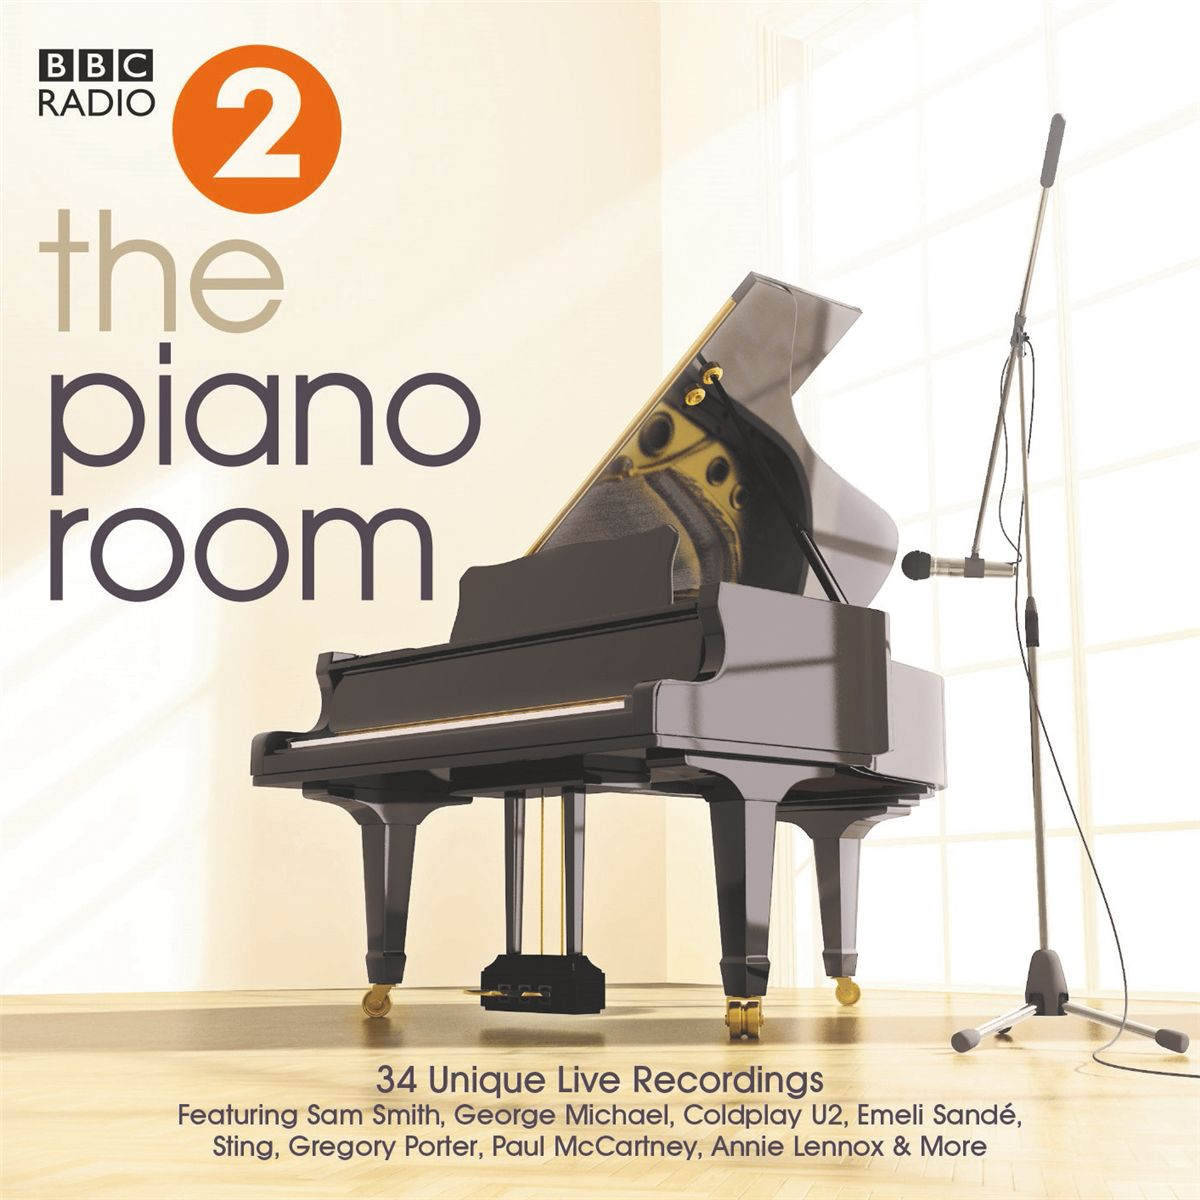 ELTON JOHN'S FAMOUS YAMAHA PIANO